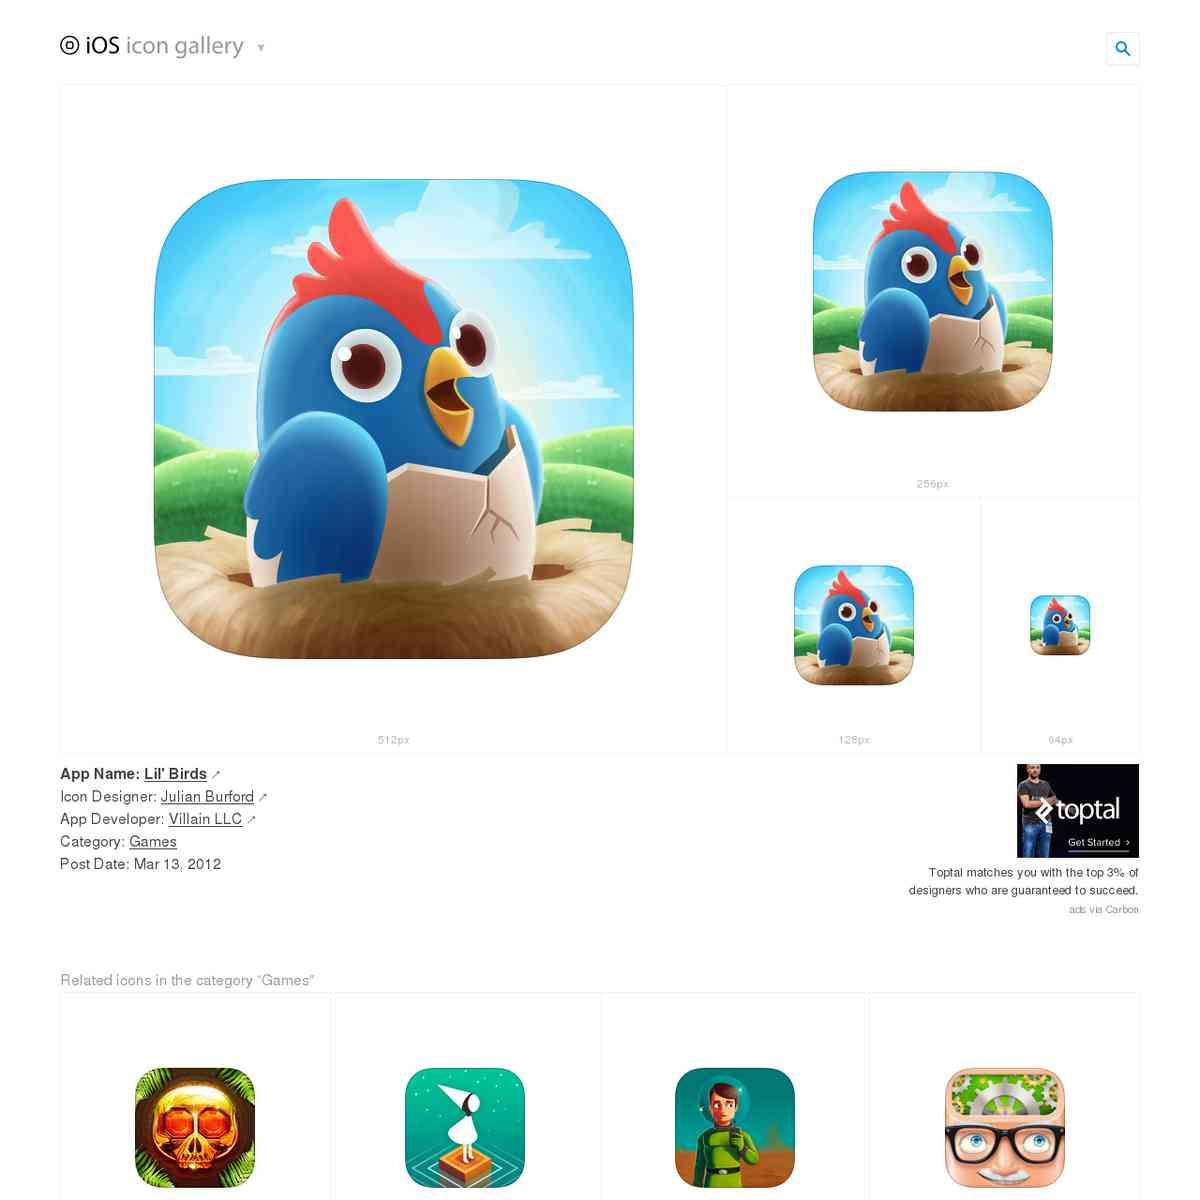 iosicongallery.com/games/lil-birds/